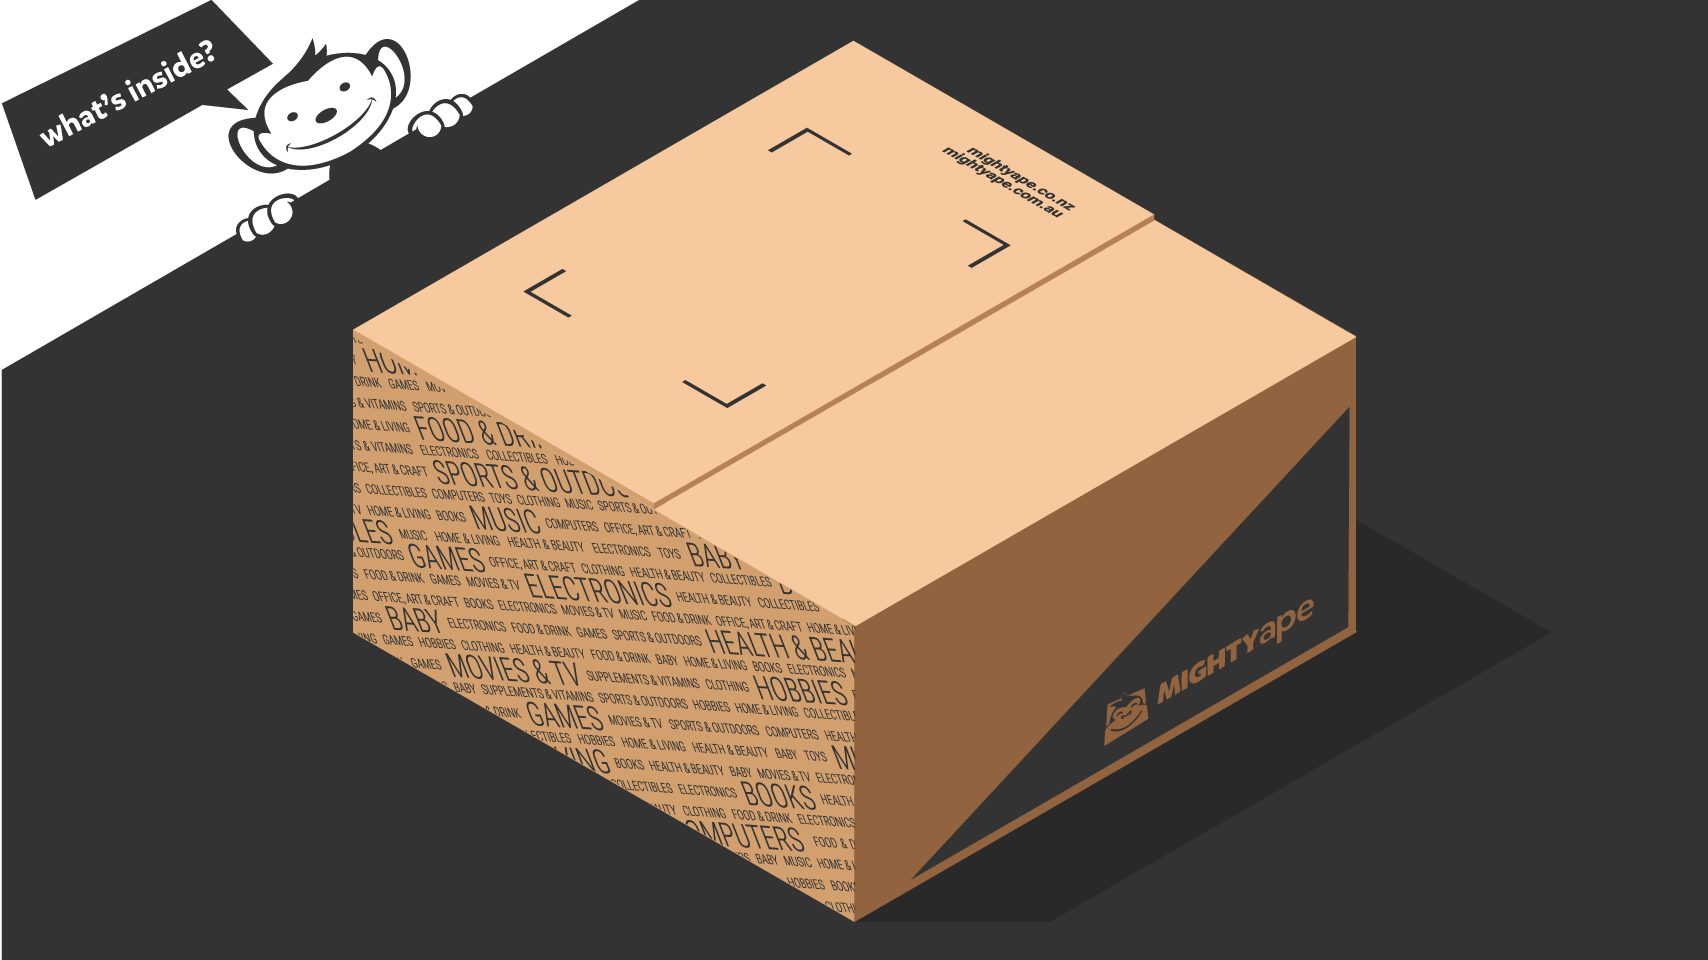 Illustration of Mighty Ape carton